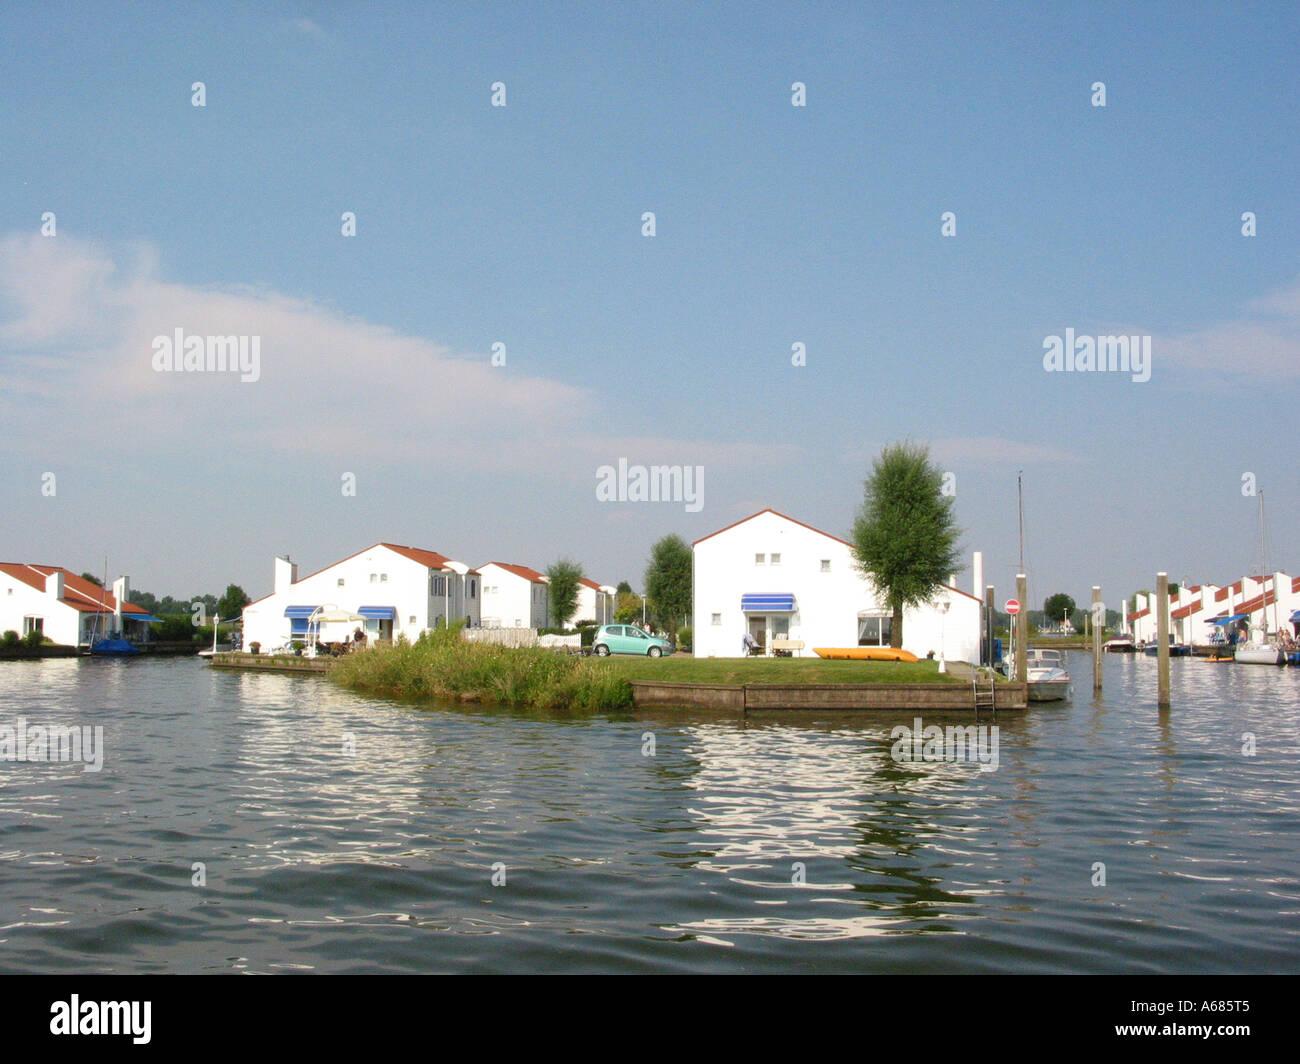 Pleasant Marina Oolderhuuske Resort With Floating Homes Built On Download Free Architecture Designs Intelgarnamadebymaigaardcom